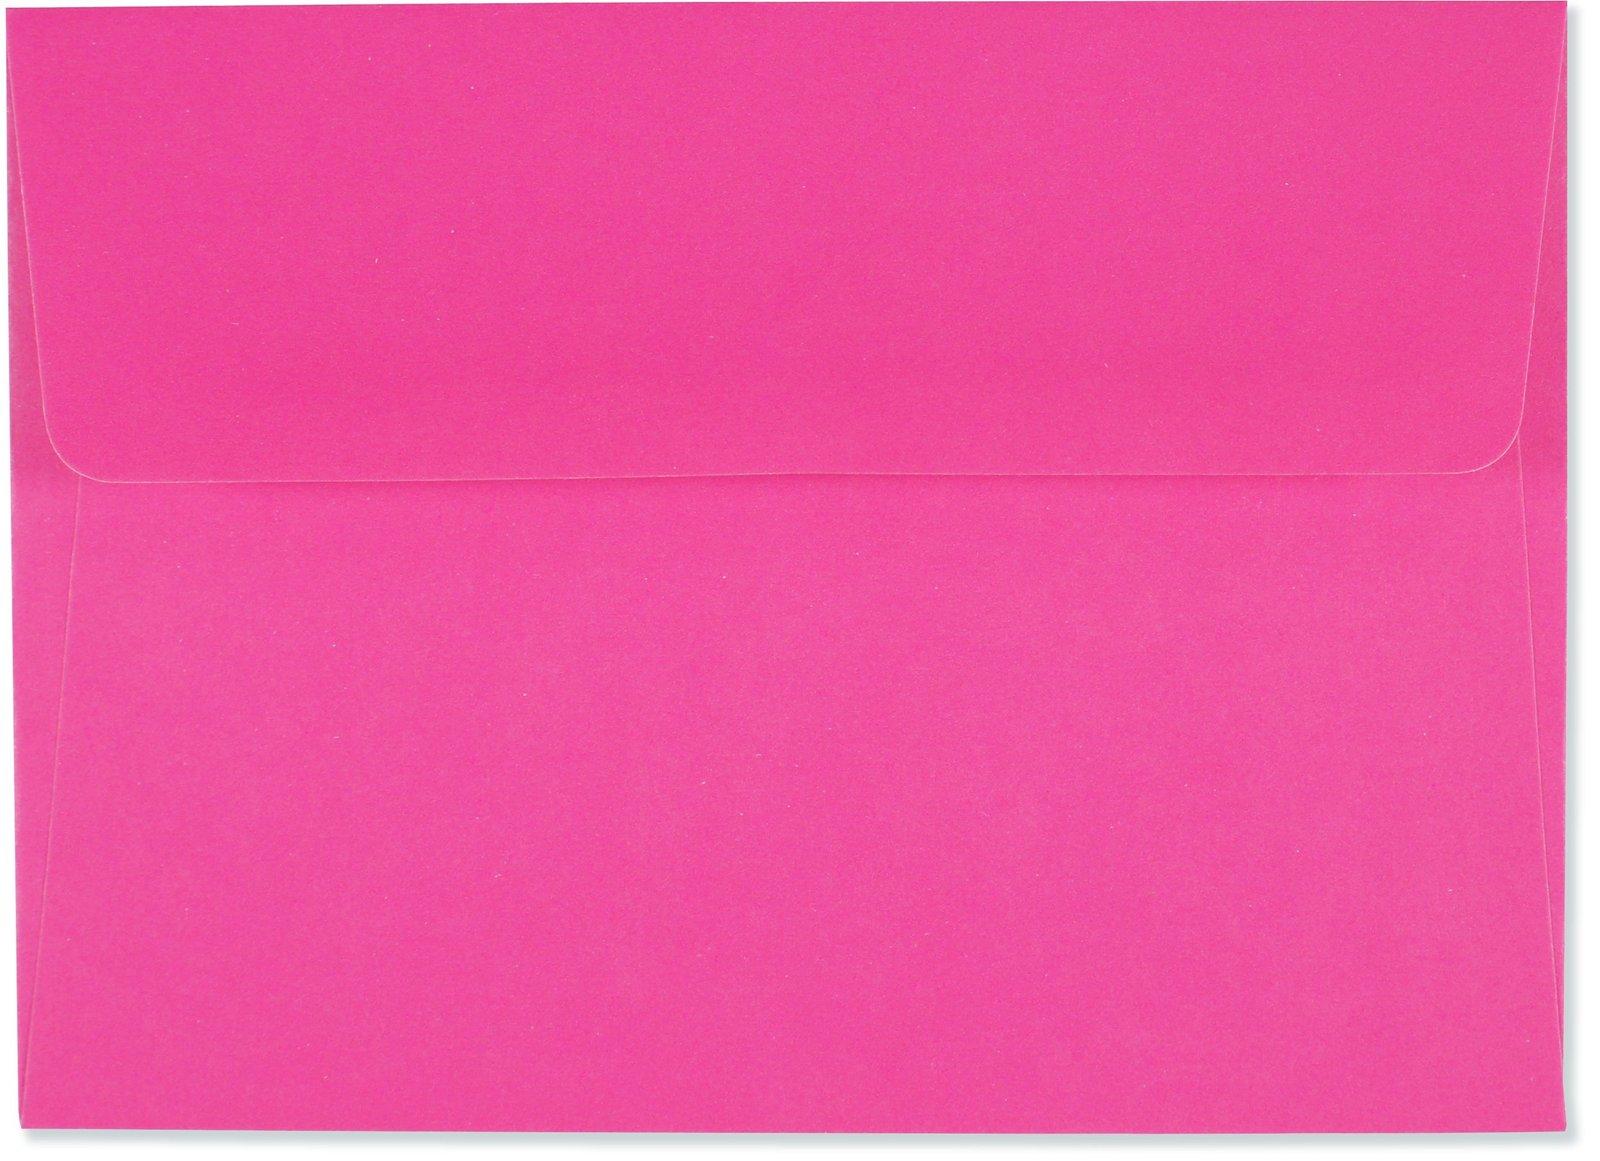 Lollipop Tree Note Cards (14 Cards/Envelopes) image